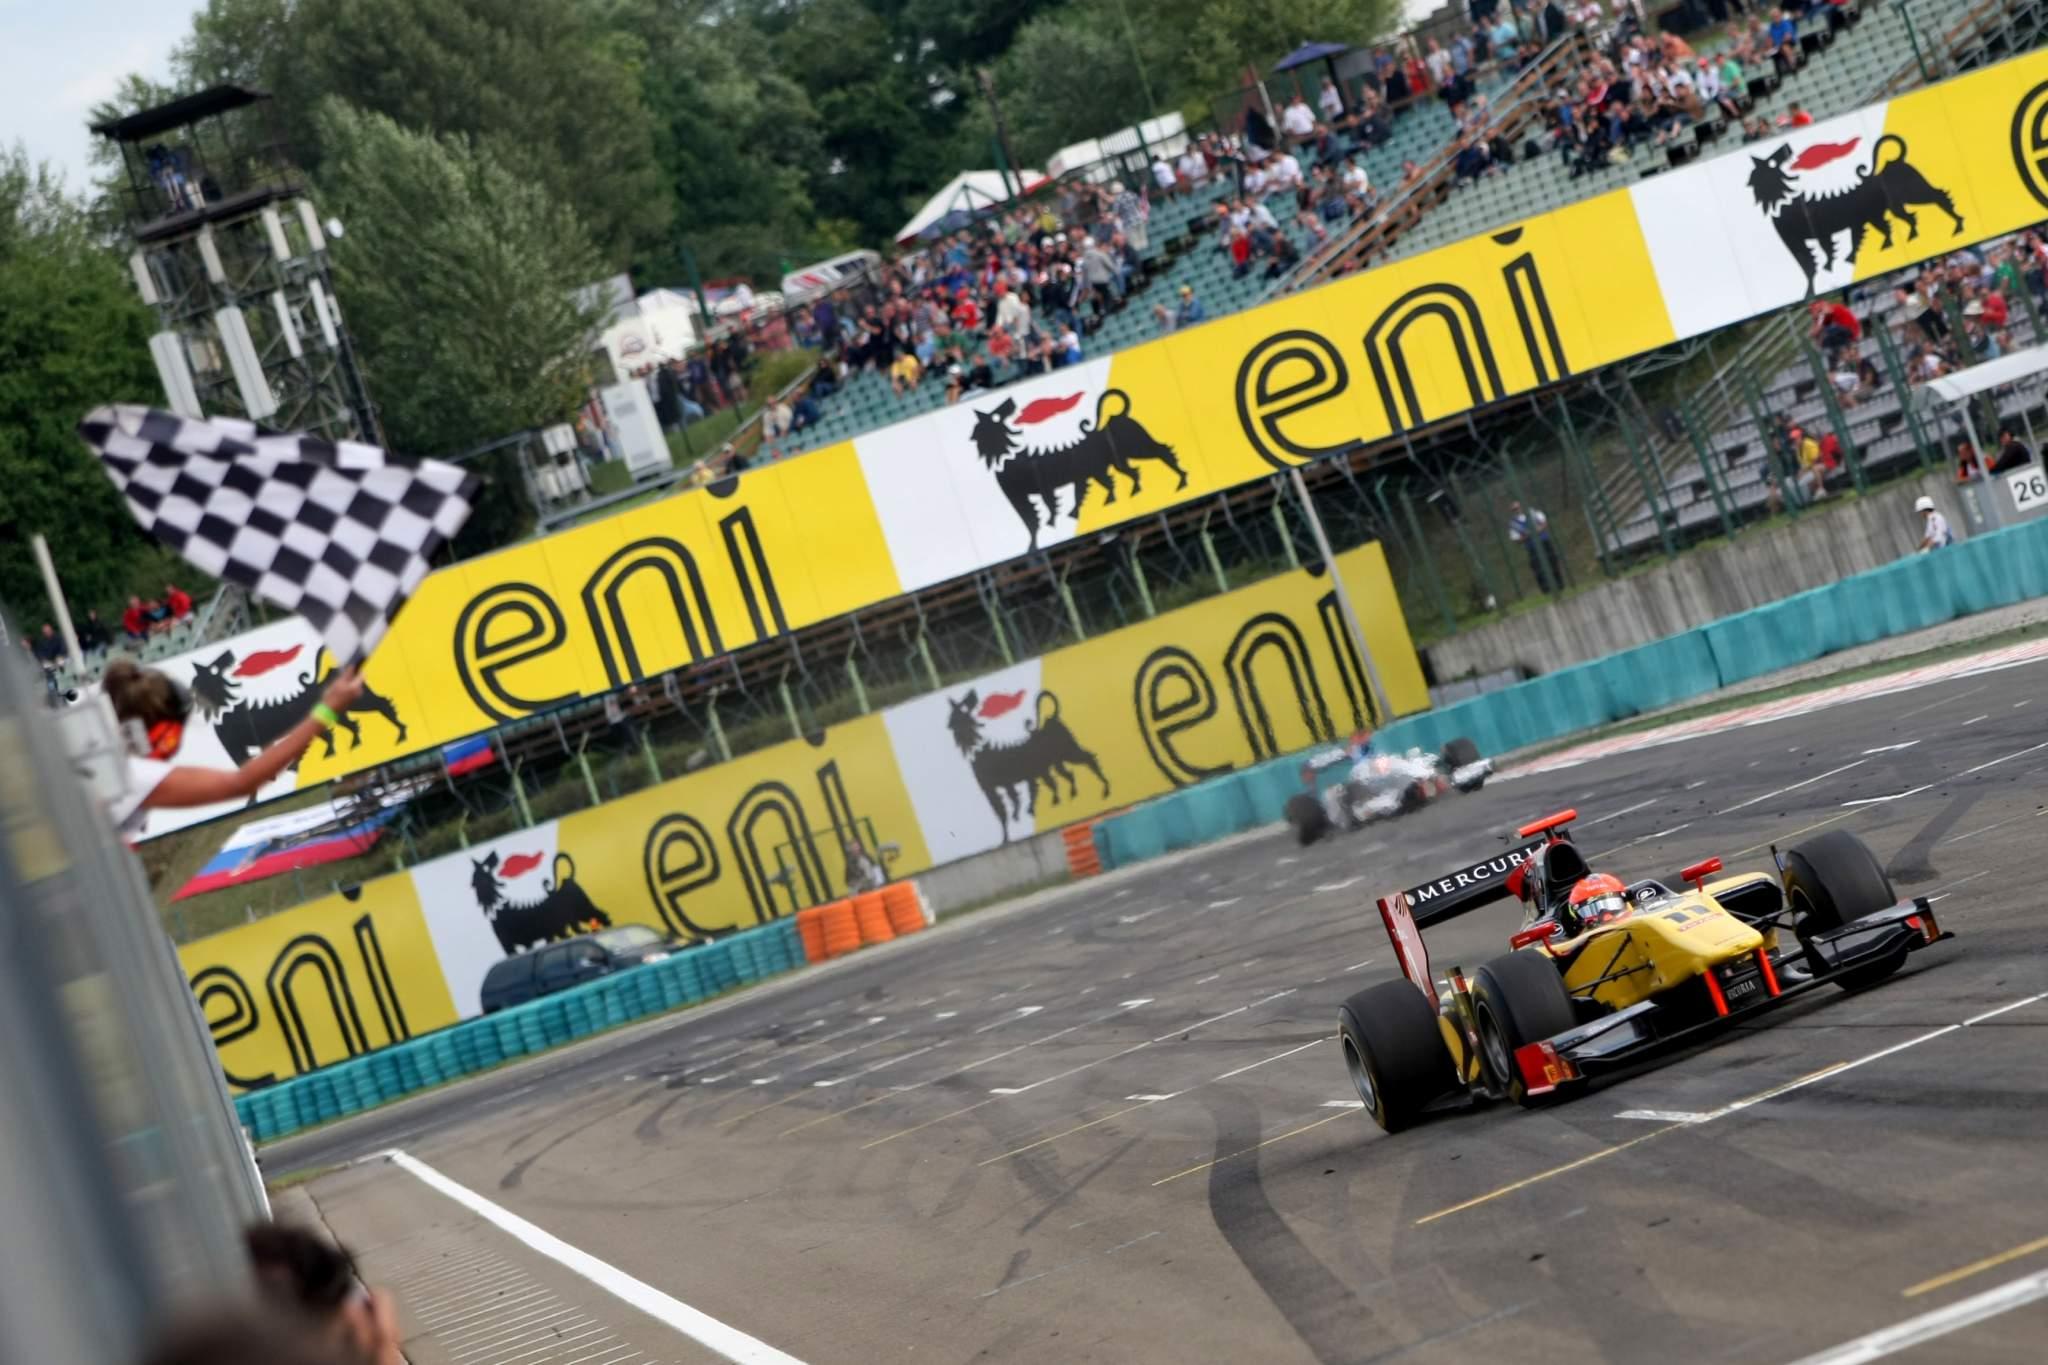 Formula 1 Grand Prix, Gp2 Race 1